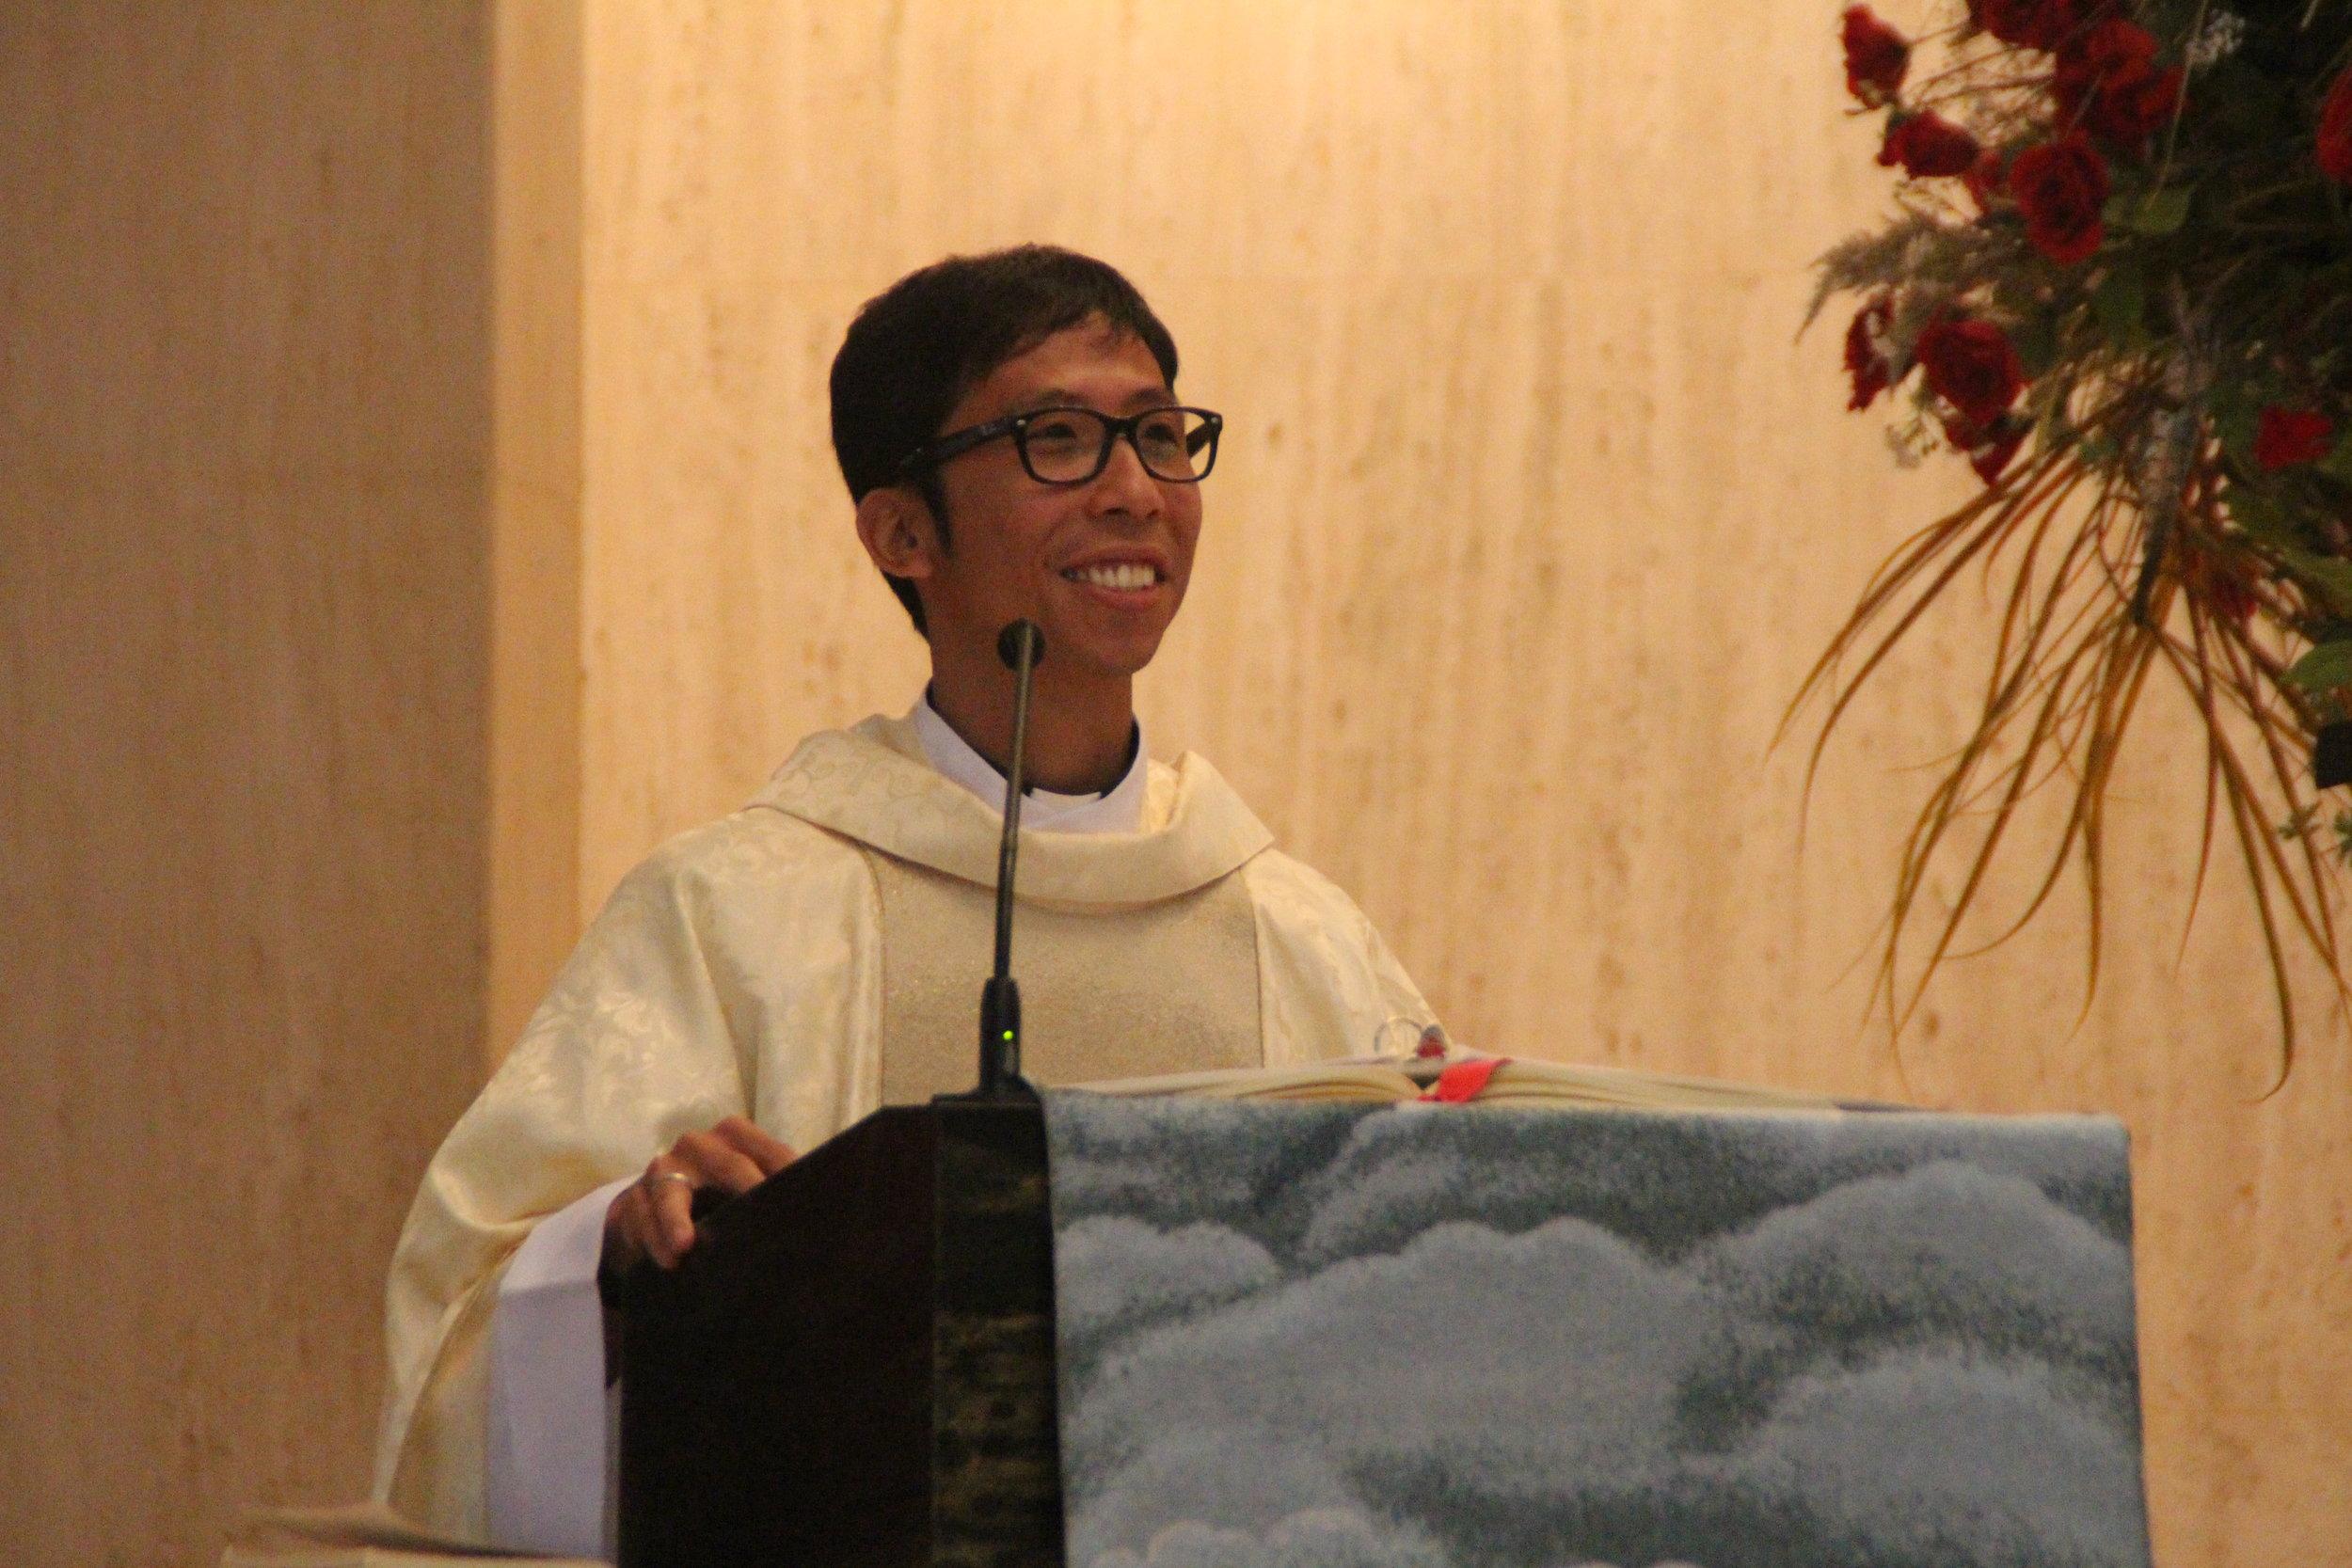 Fr. Richie Mercado, O.S.A.